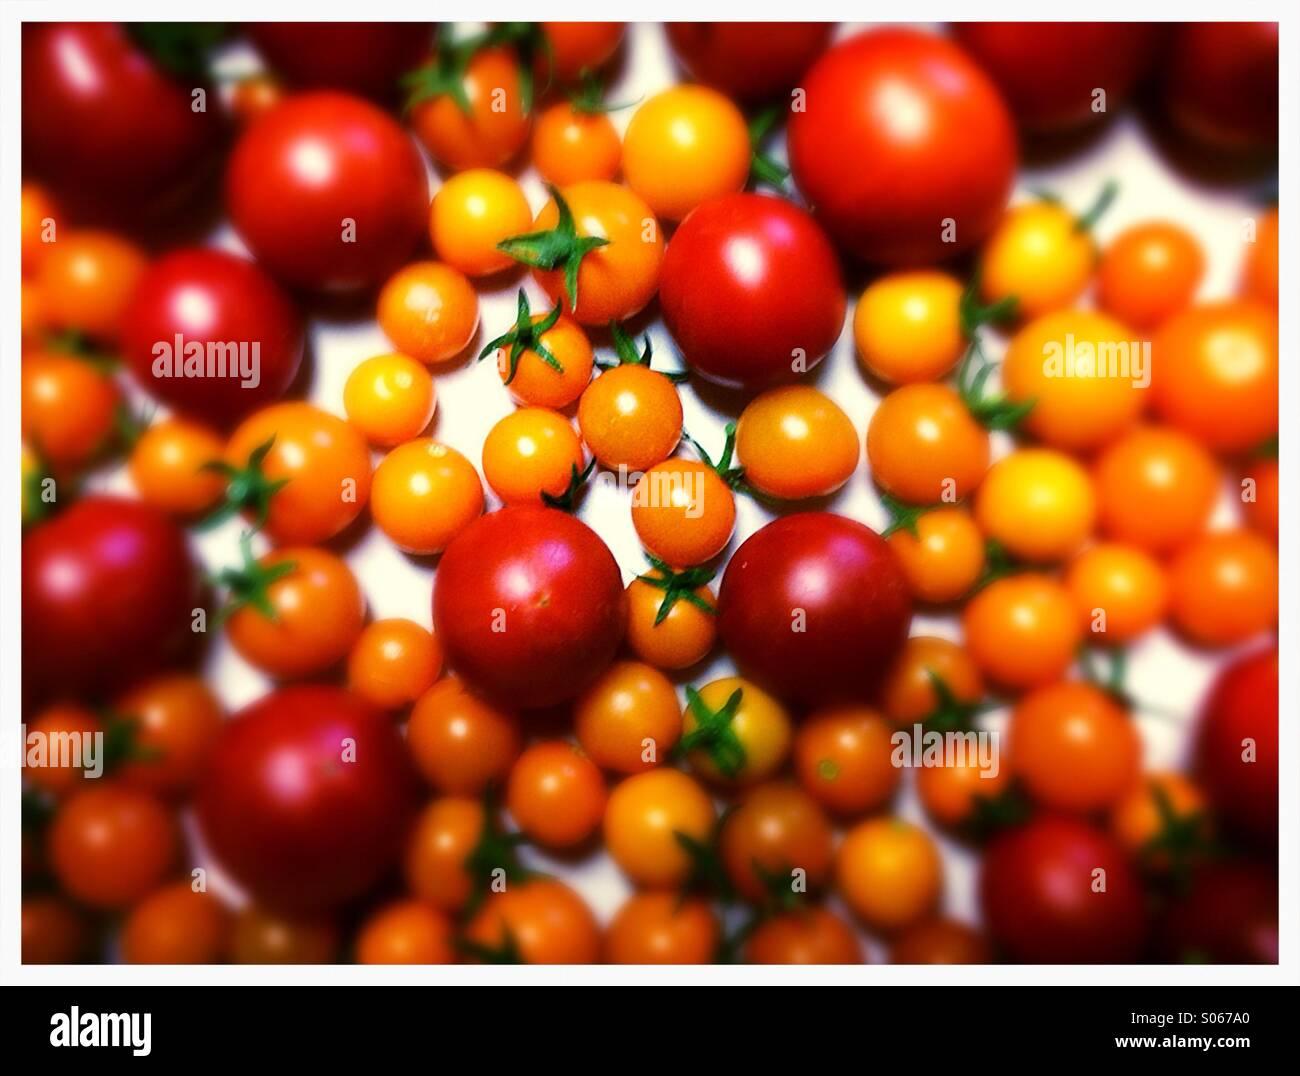 Tomato yum - Stock Image